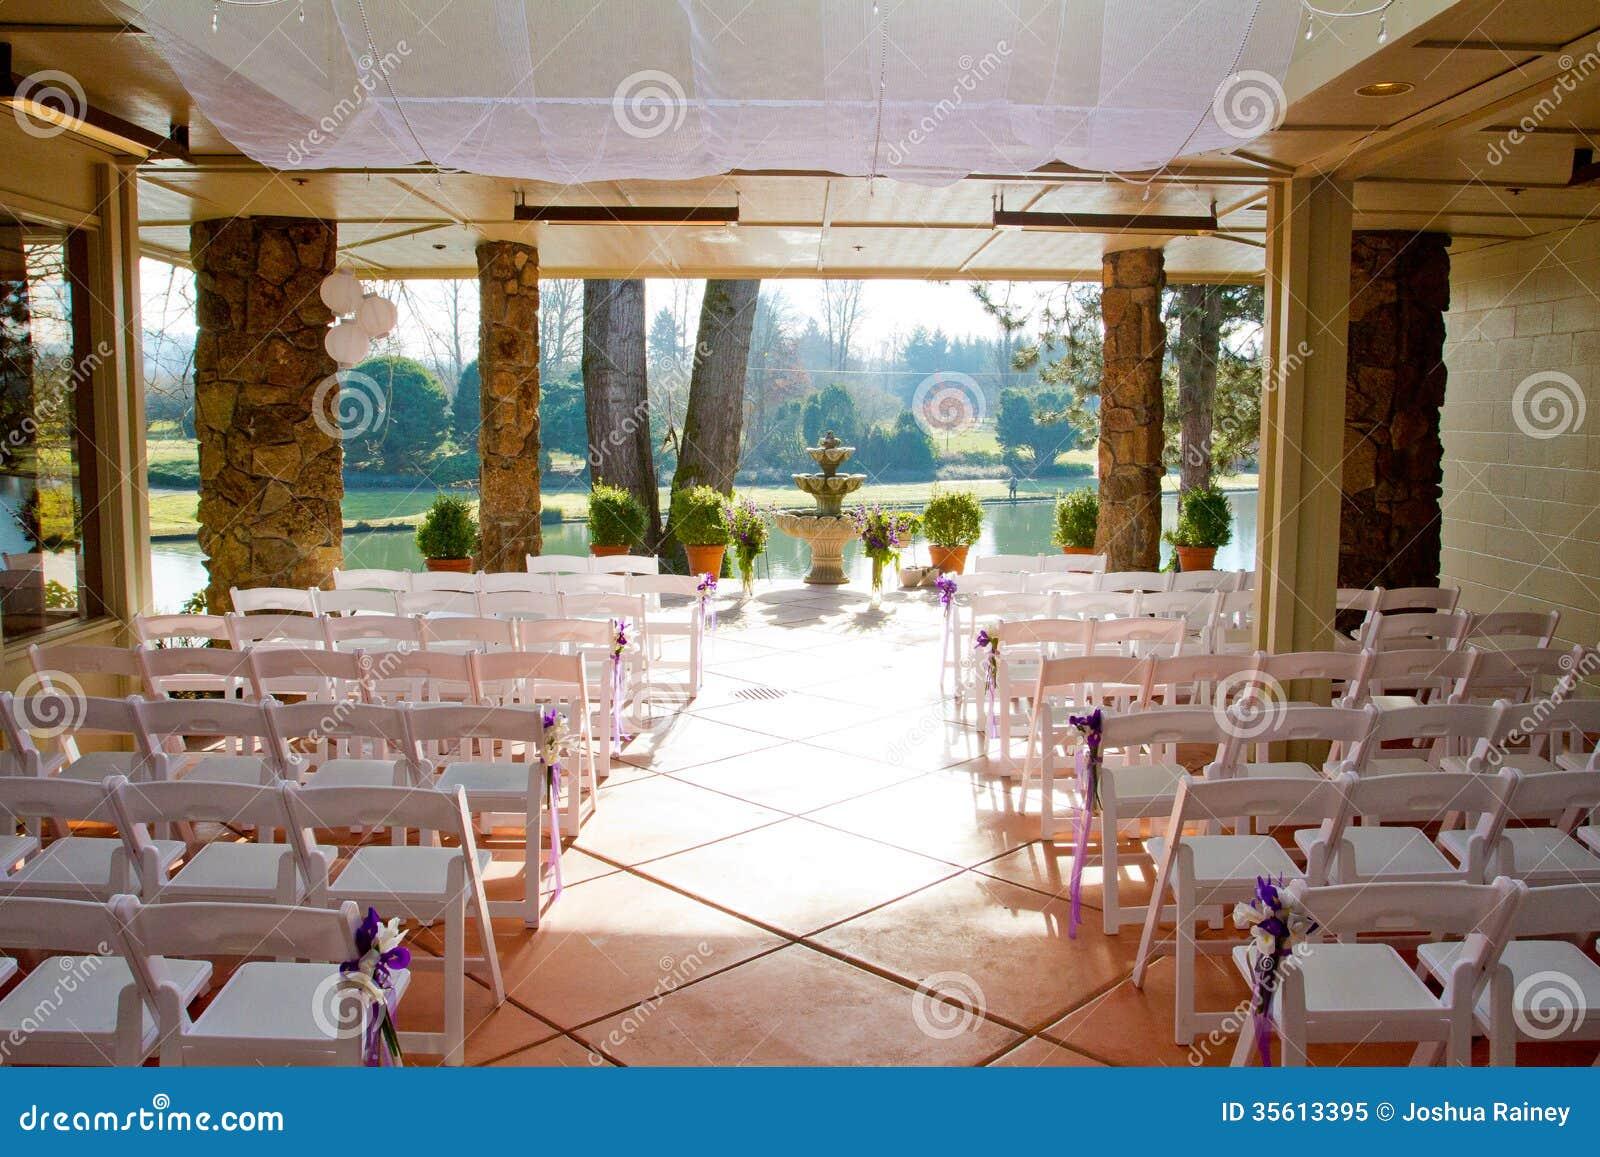 Indoor wedding venue royalty free stock photo image for Small indoor wedding venues